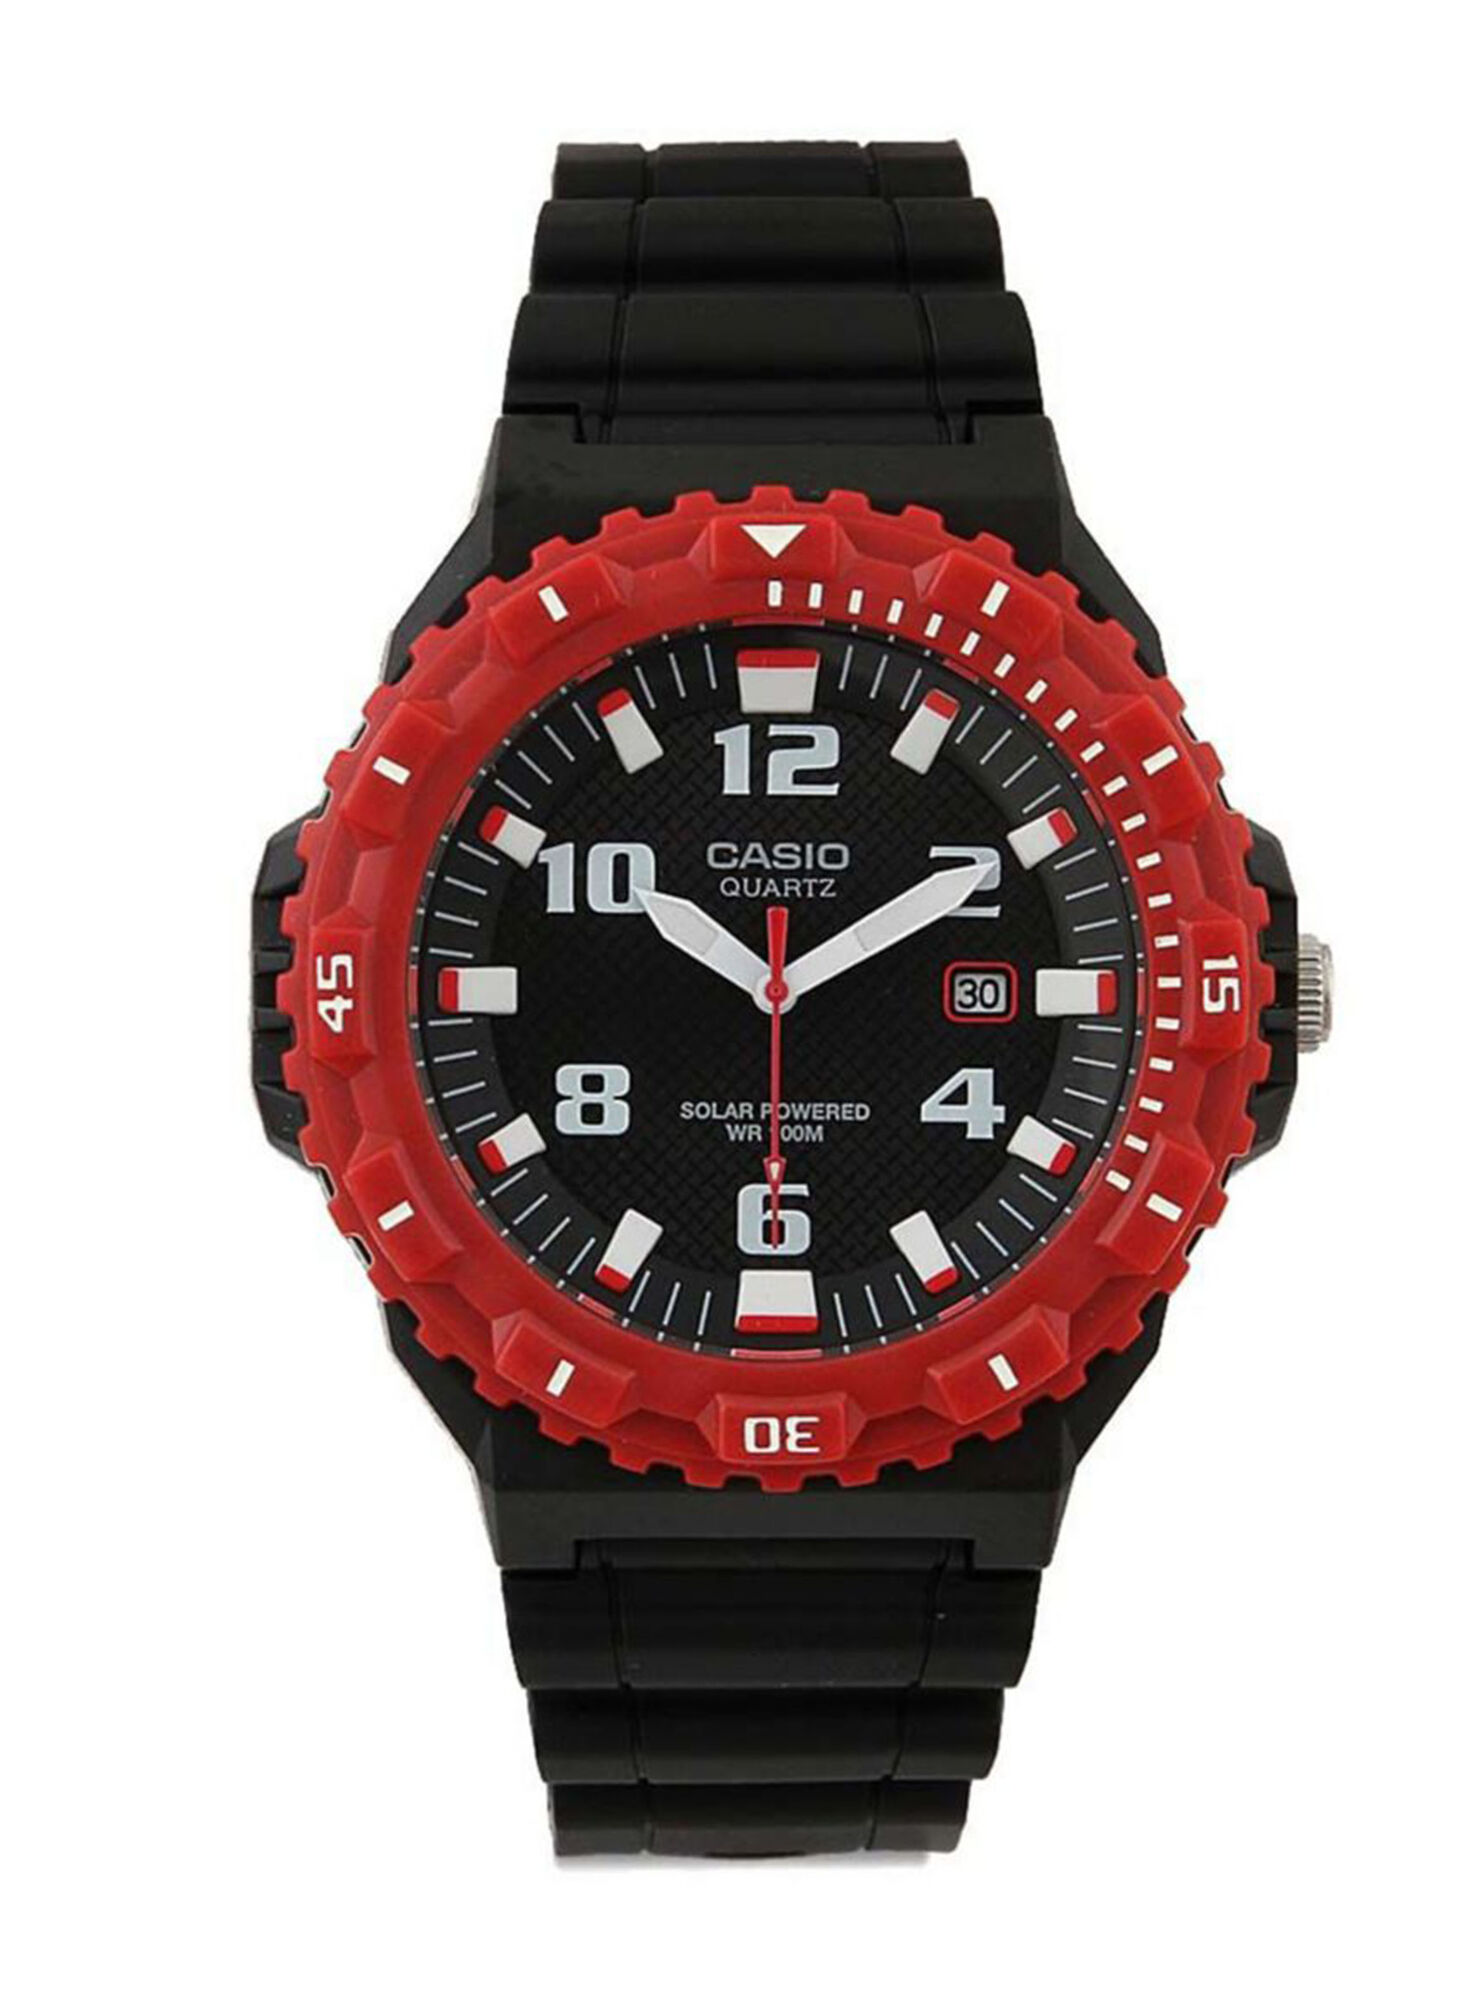 305188925009 Reloj Análogo Casio MRW-S300H-4BVDF Hombre en Relojes